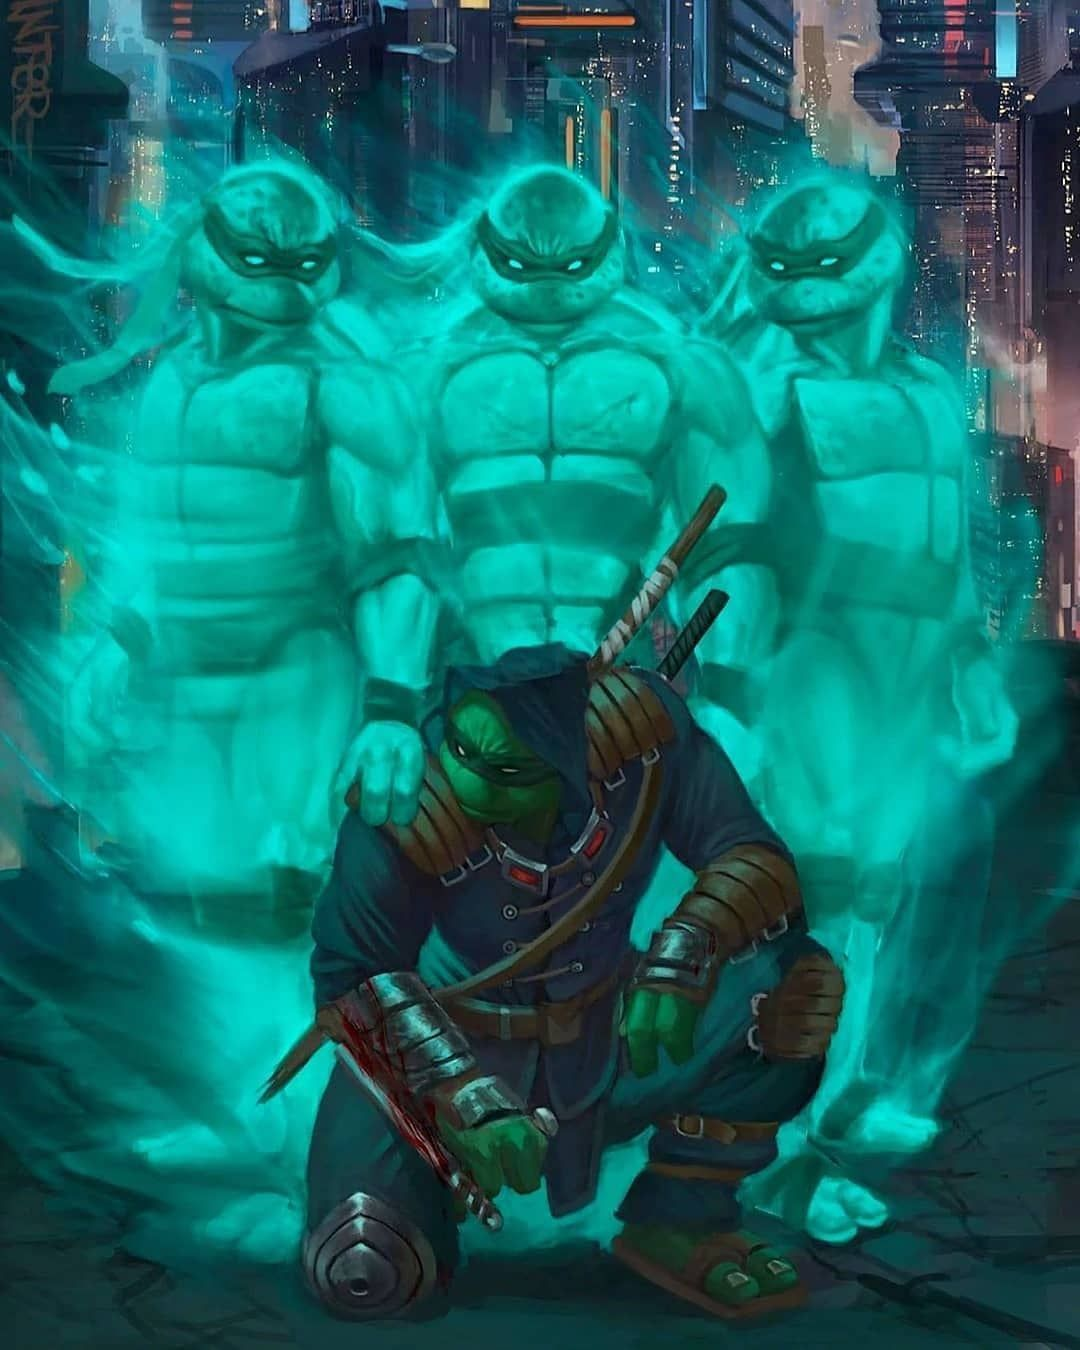 "31.6k Likes, 115 Comments - Super Heroes And Villains (@superheros_and_villainx) on Instagram: ""TMNT: T… | Ninja turtles art, Tmnt, Teenage mutant ninja turtles art"